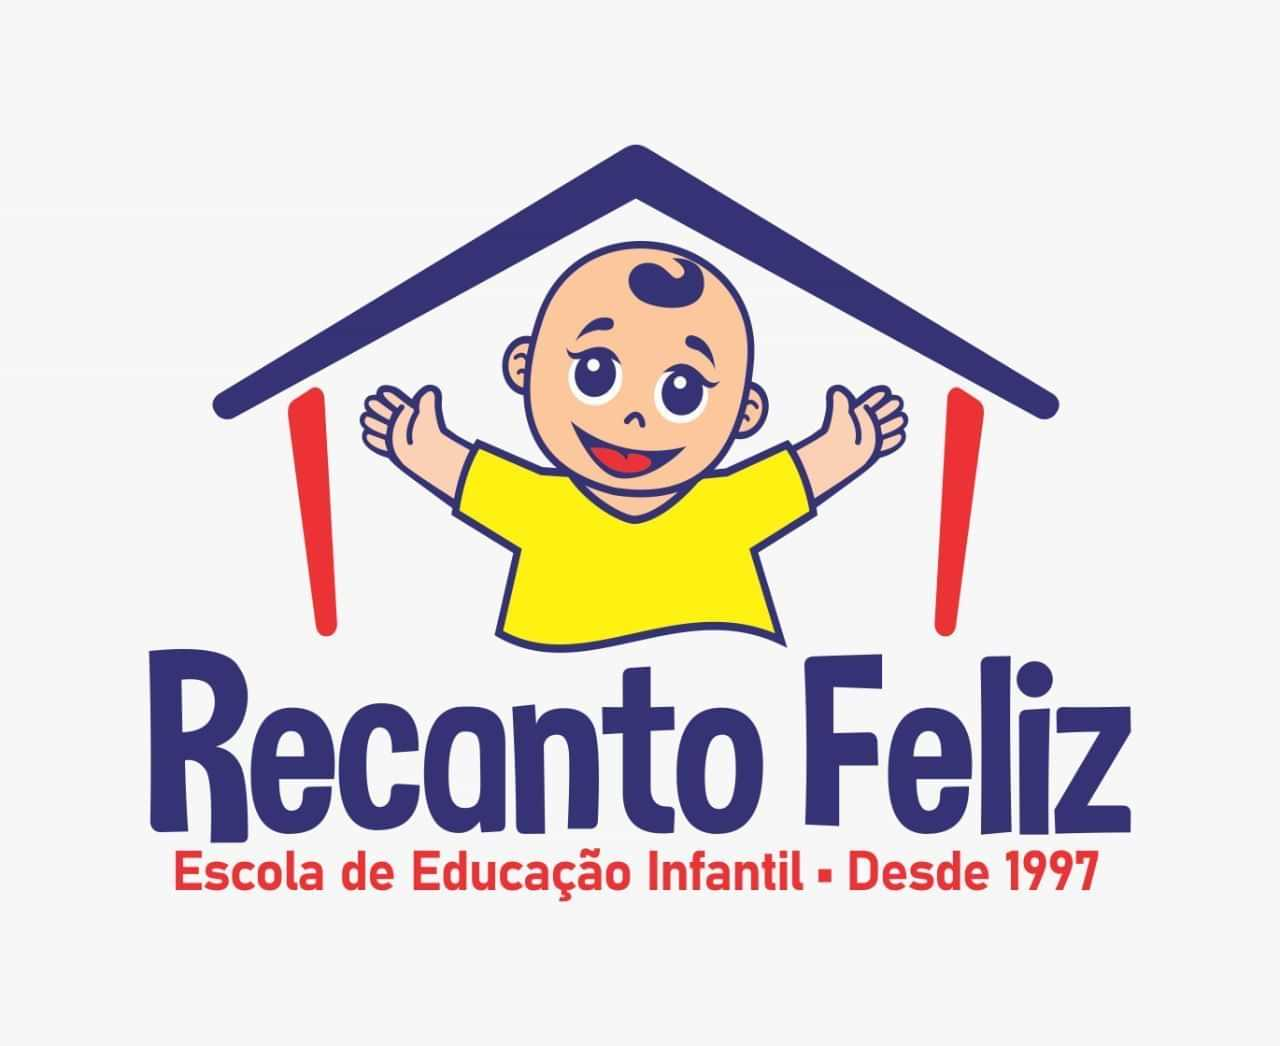 Centro Infantil Recanto Feliz